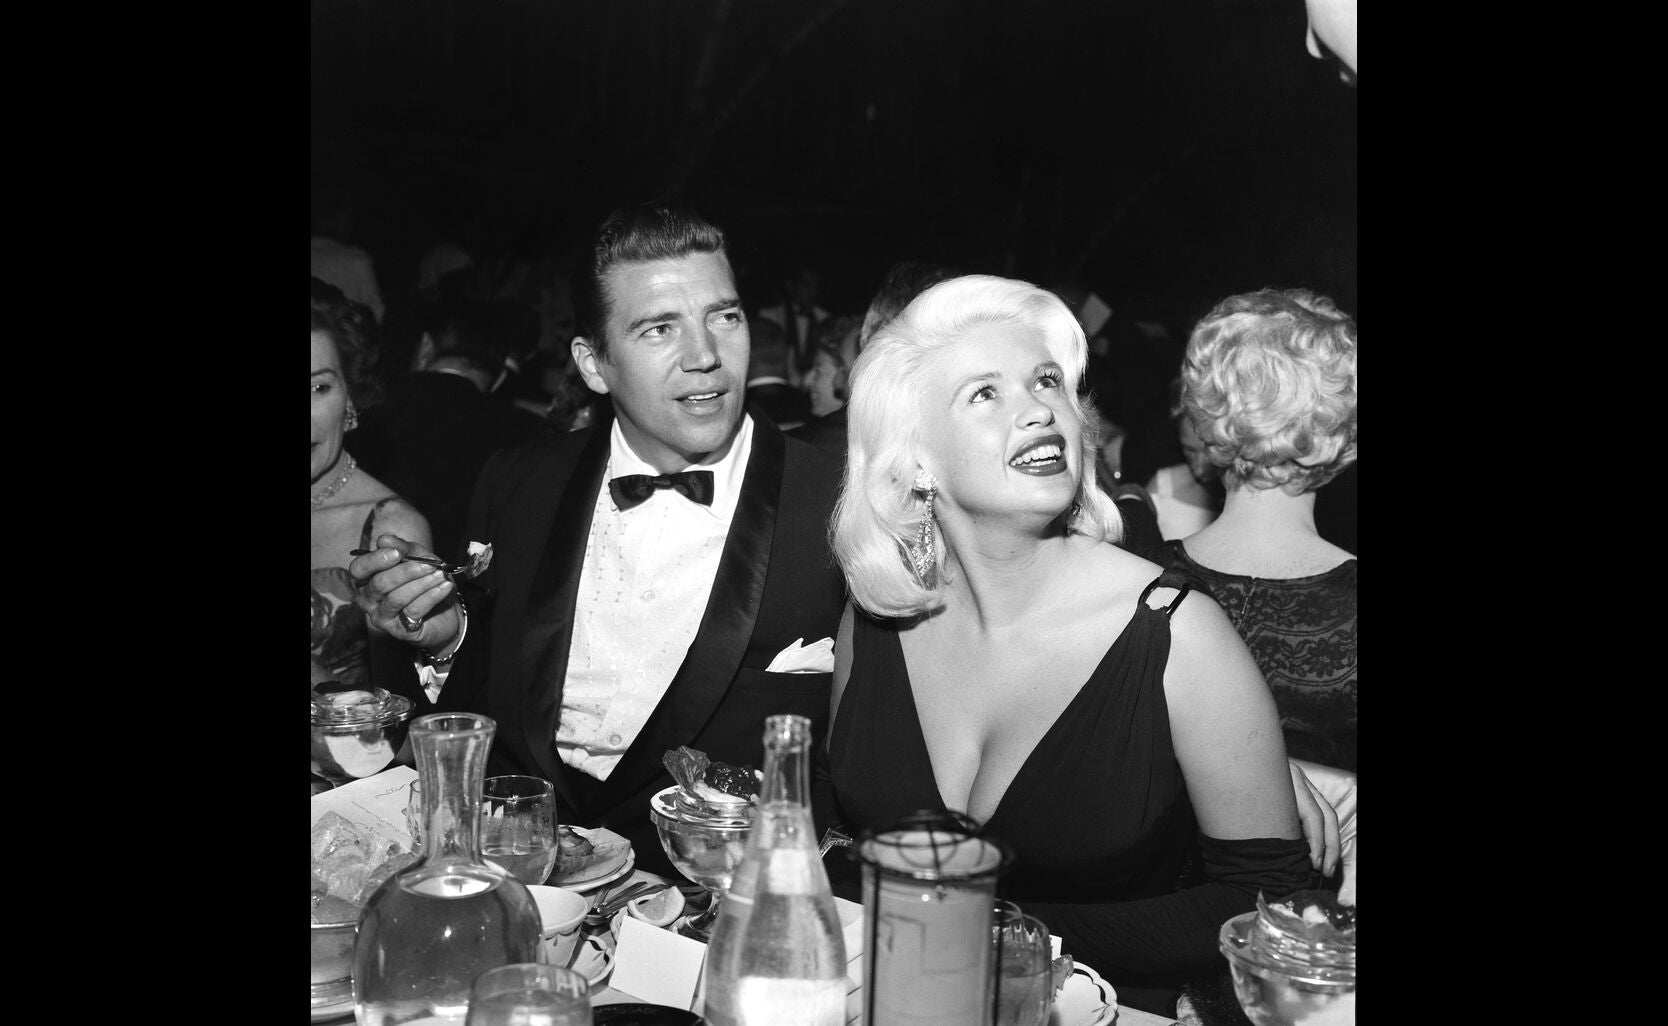 Actress Jayne Mansfield and Mickey Hargitayat the Golden Globes 1958